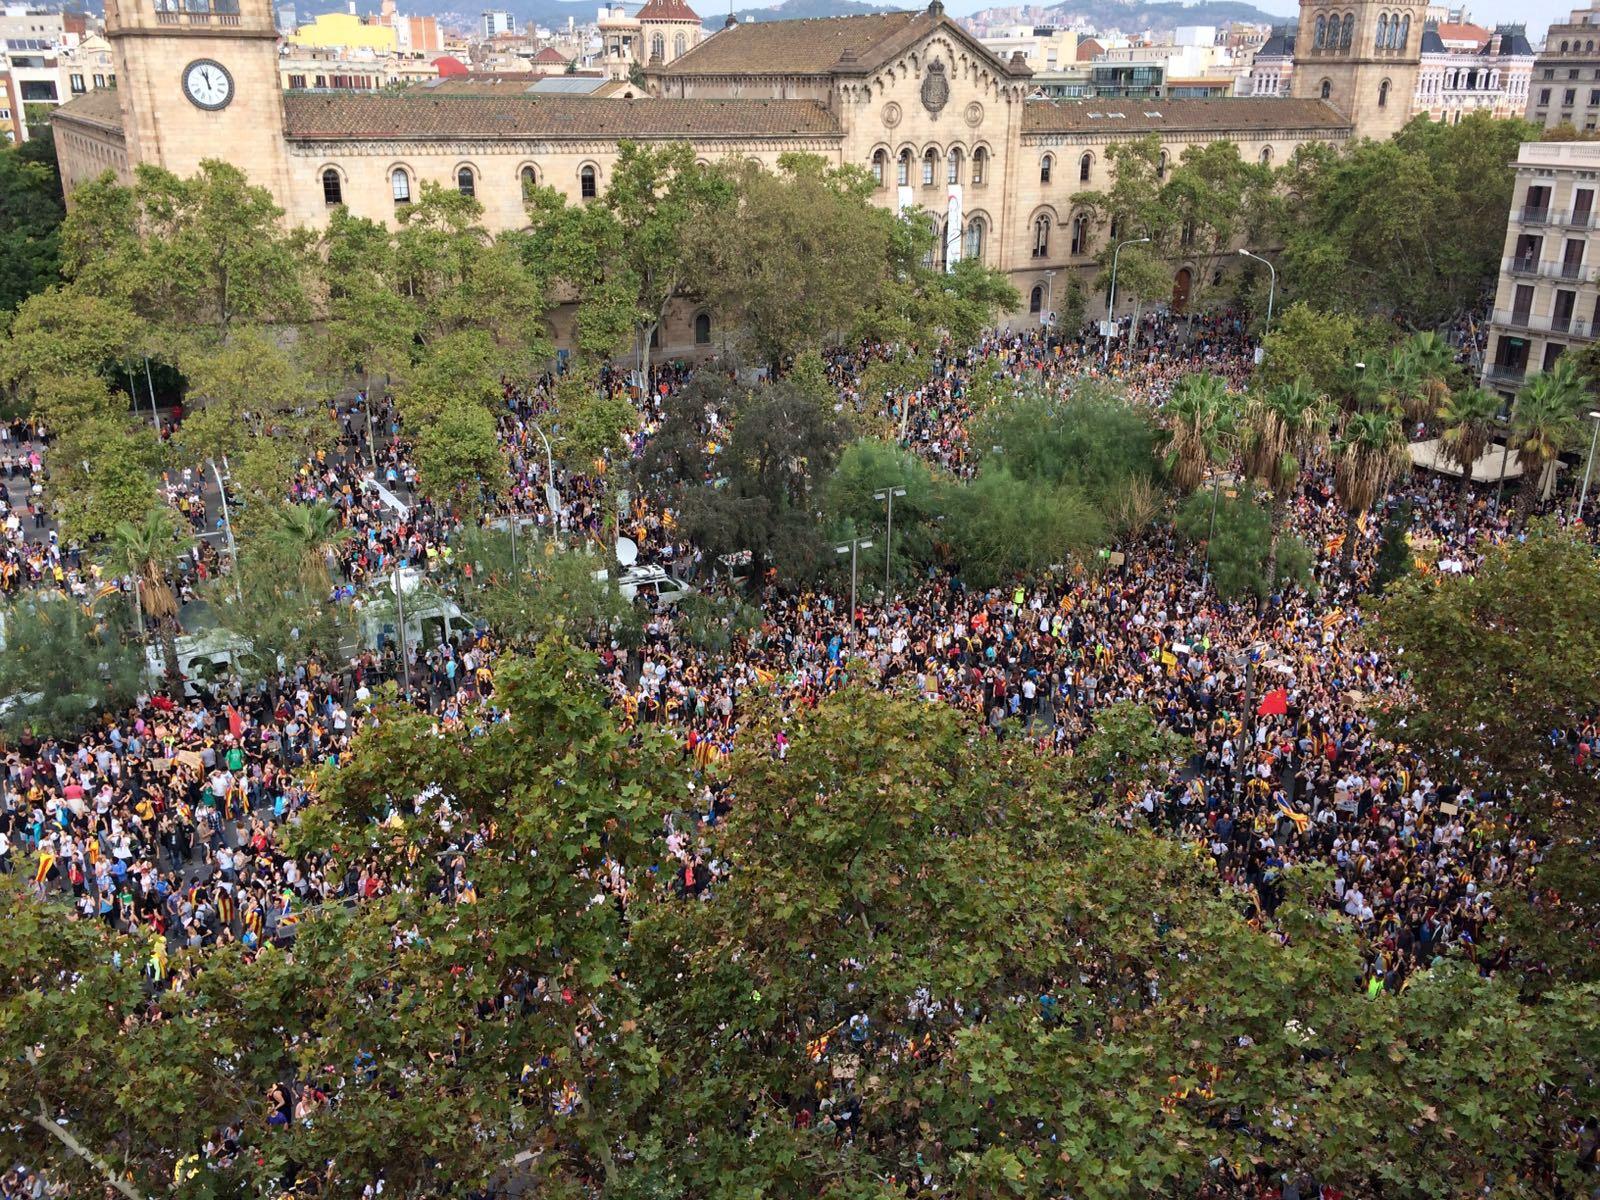 File pla a universitat barcelona 3rd october - Placa universitat barcelona ...